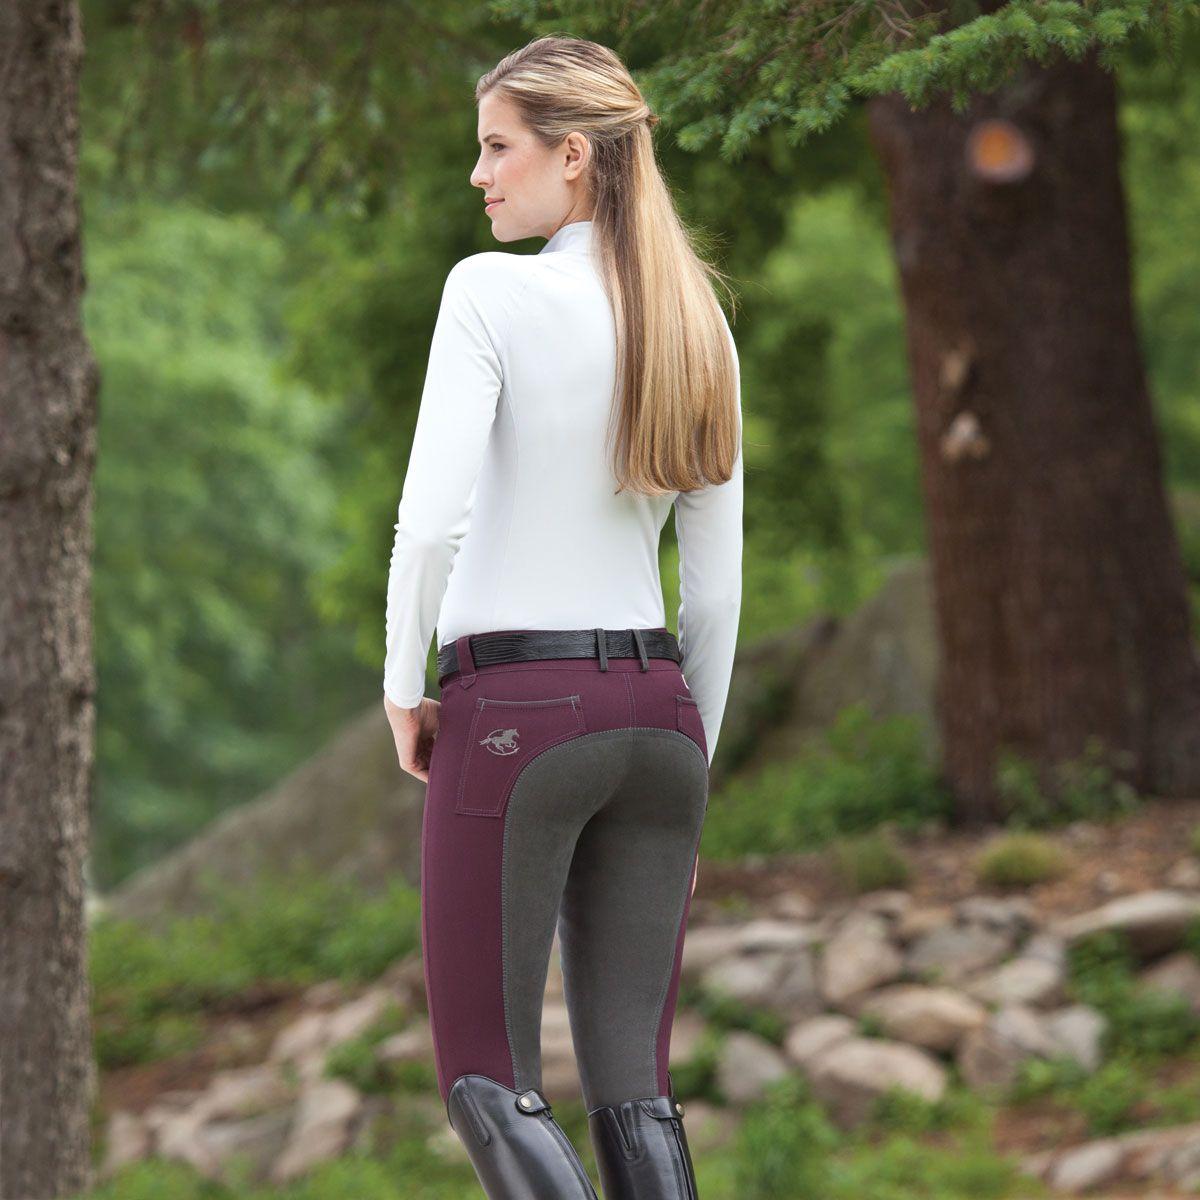 Piper Breeches By Smartpak Original Full Seat Elegant